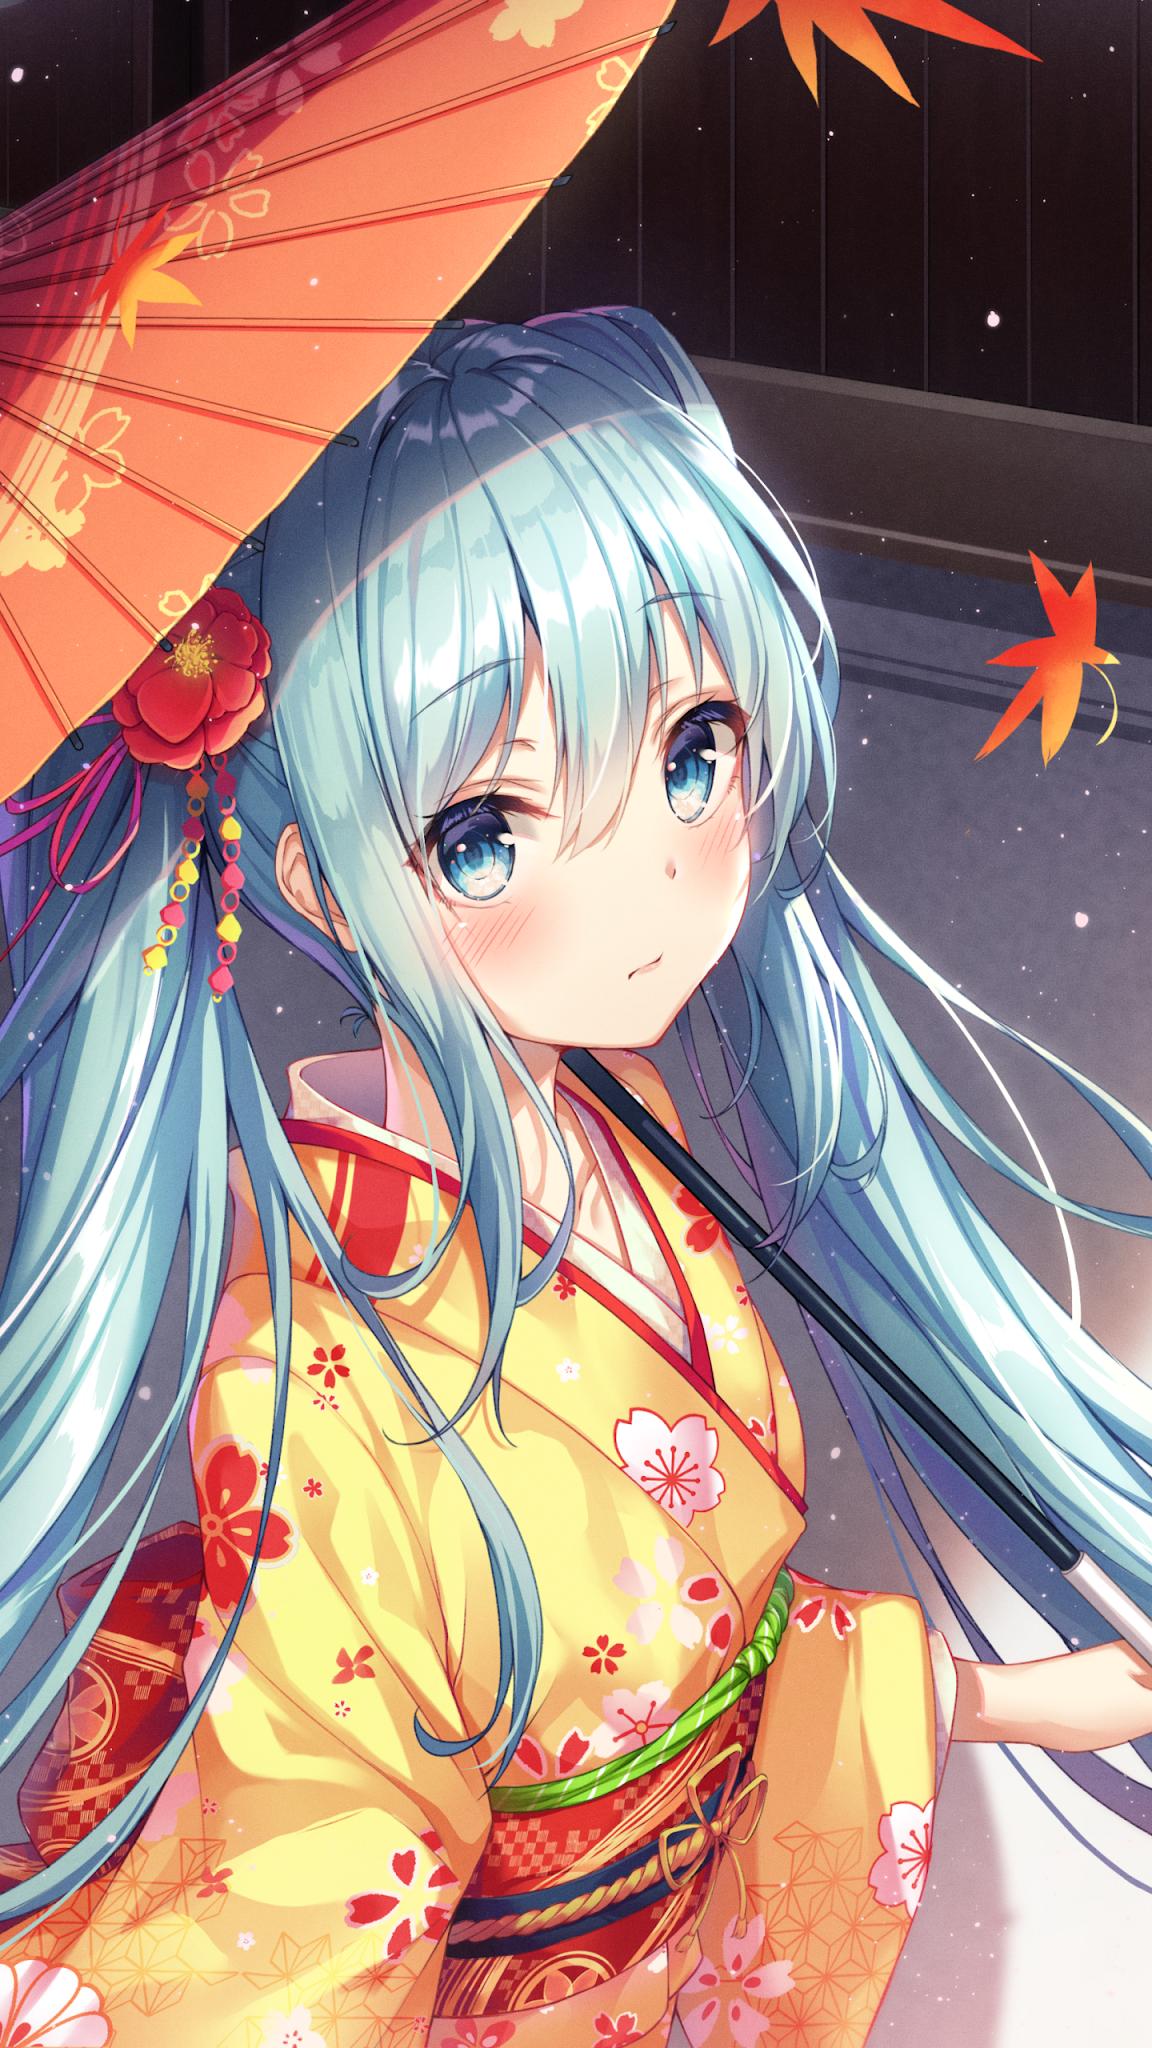 Anime Wallpaper Ipad : anime, wallpaper, Hatsune, Miku,Anime,,mobile, Wallpaper,Vocaloid, Anime, Wallpaper, Iphone,, Wallpapers,